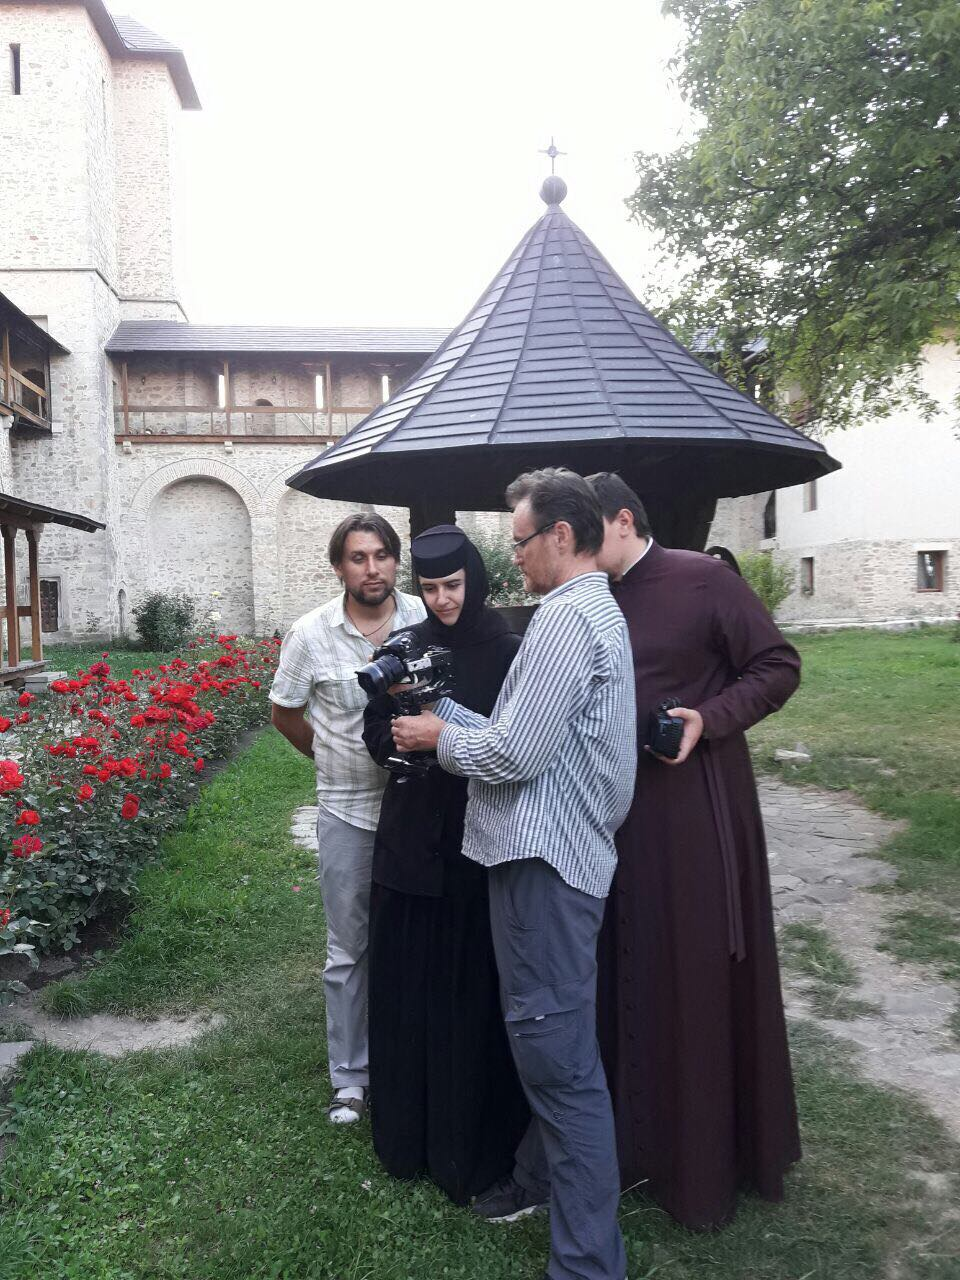 Фото athos-ukraine.com